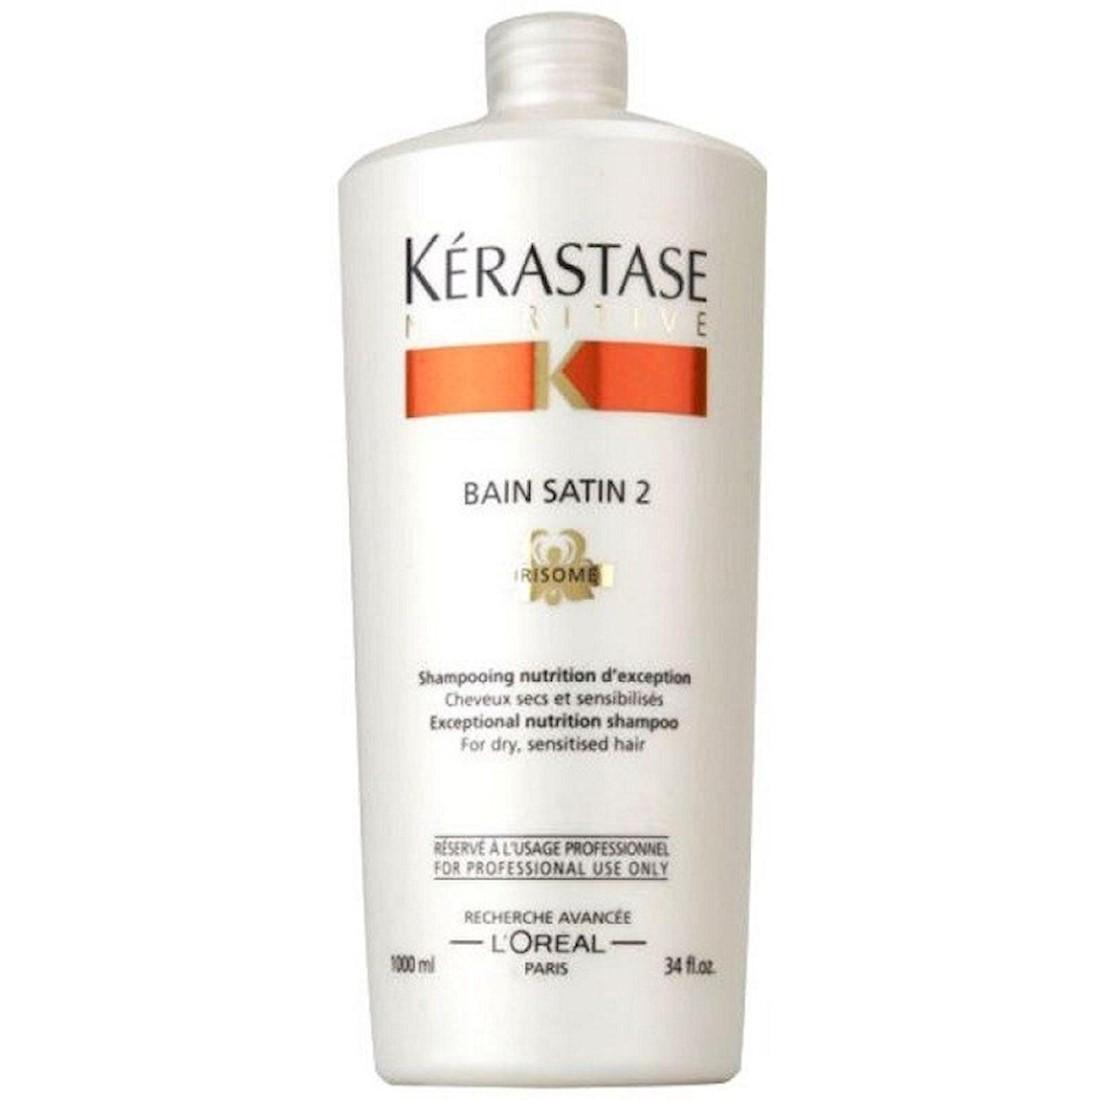 Kérastase Nutritive Bain Satin 2 - Shampoo Cabelos Secos 1L - CA